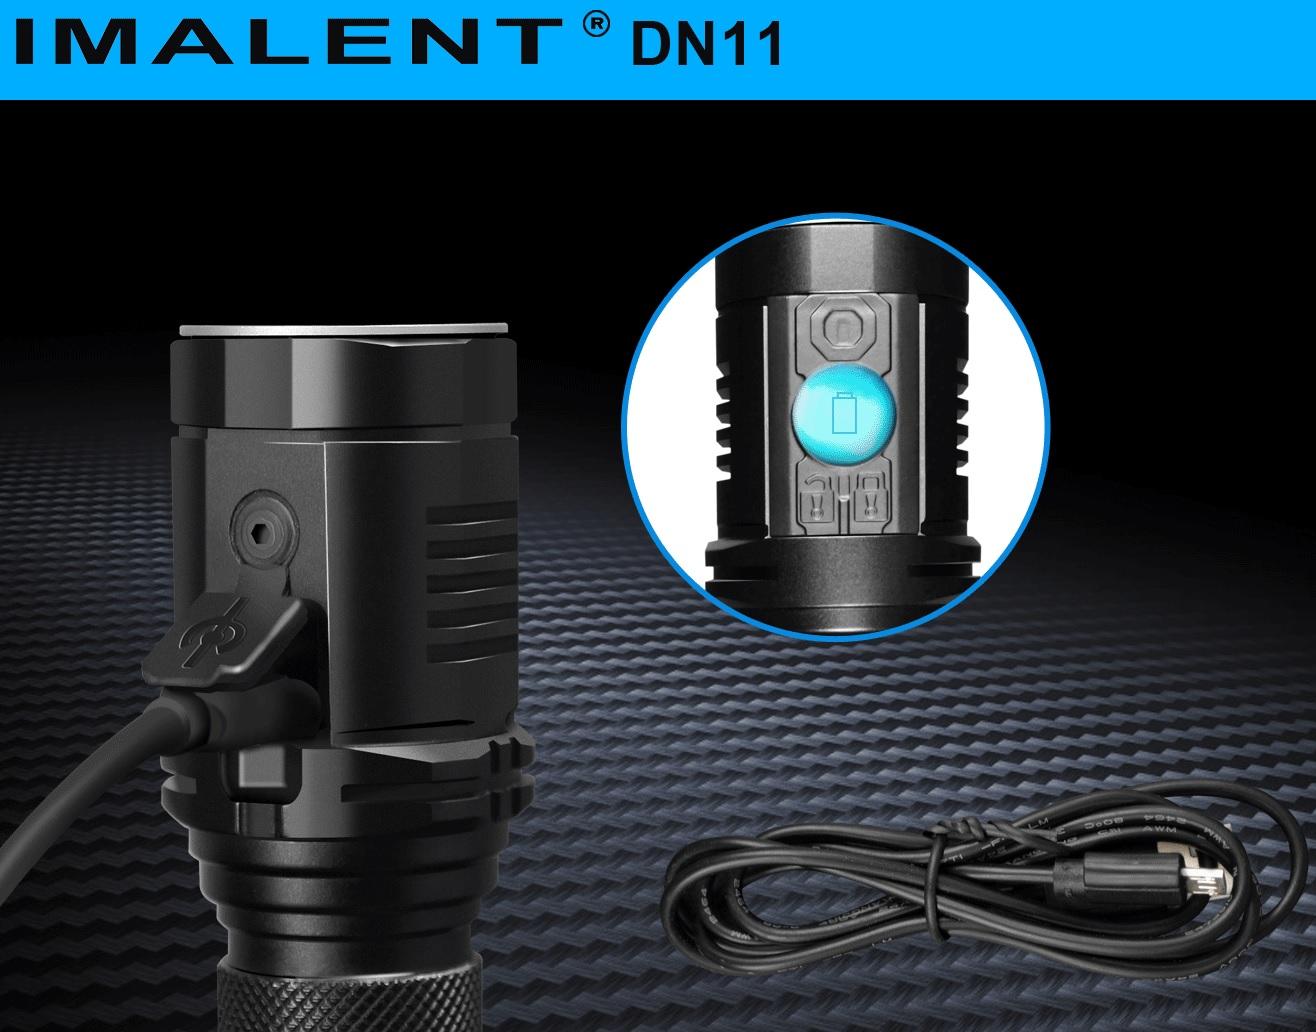 IMALENT DN11 LINTERNA LED CARGA USB